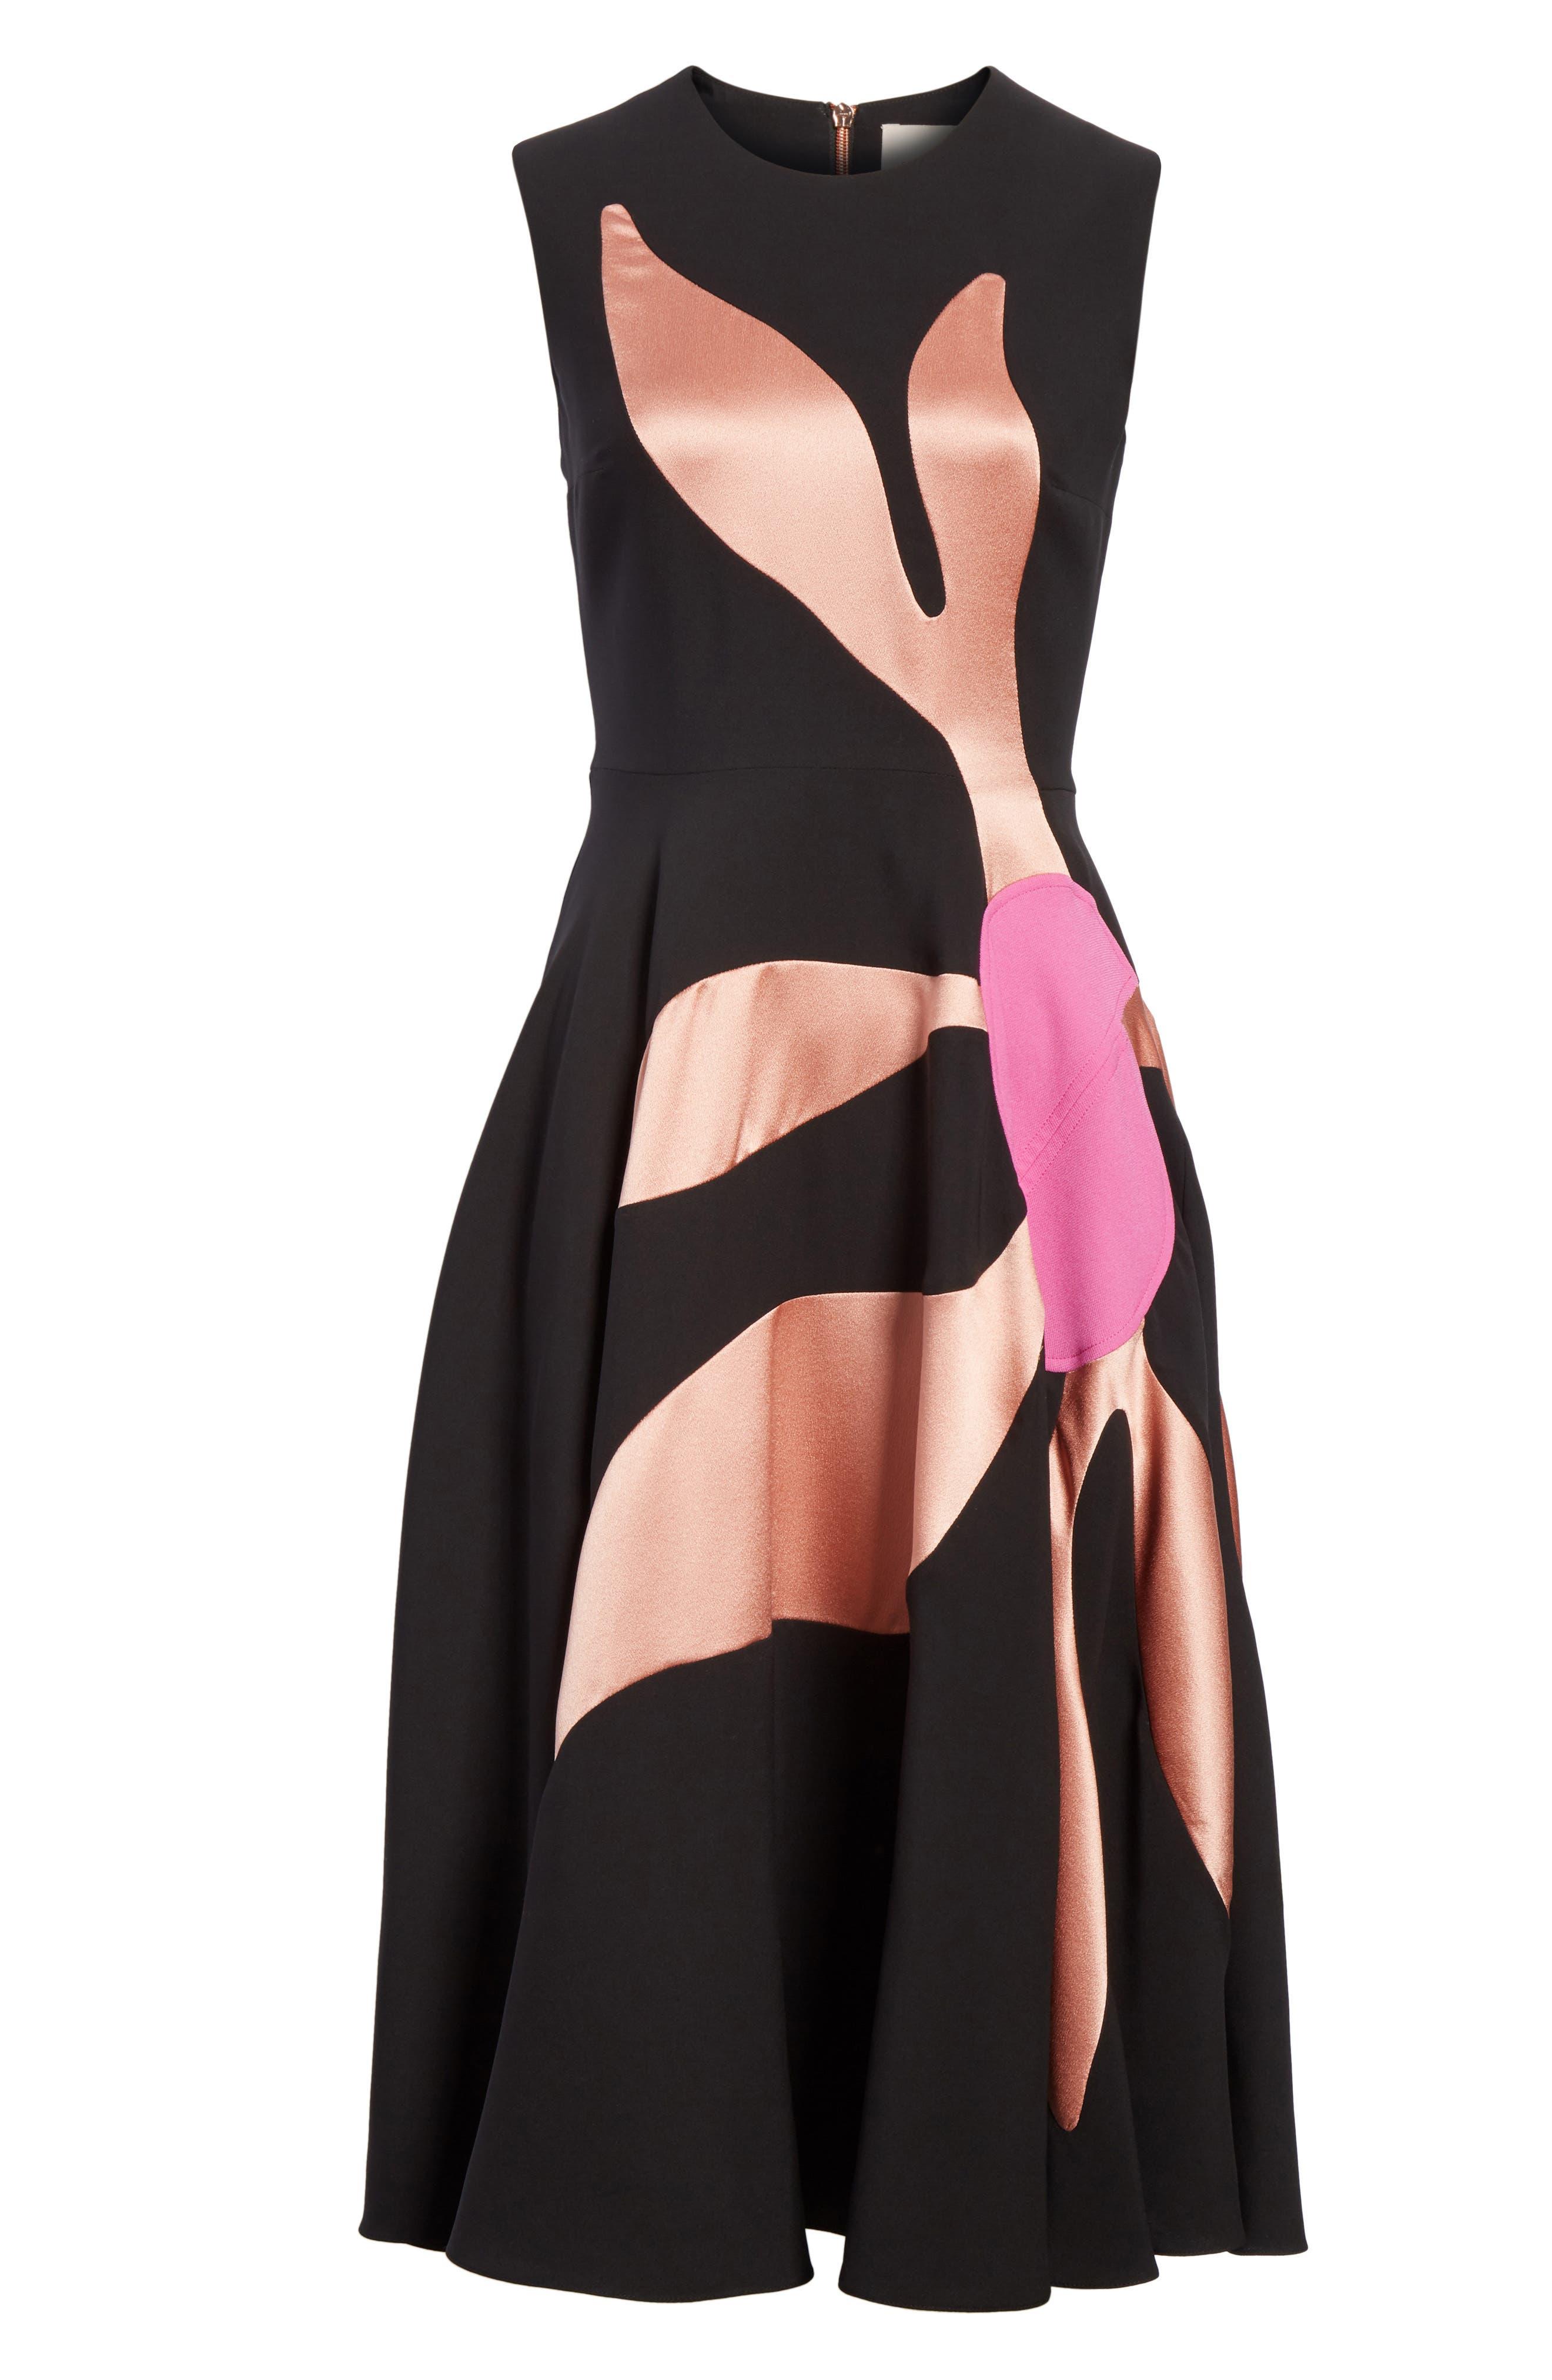 Ilia Floral Inlay Silk Blend Dress,                             Alternate thumbnail 6, color,                             001